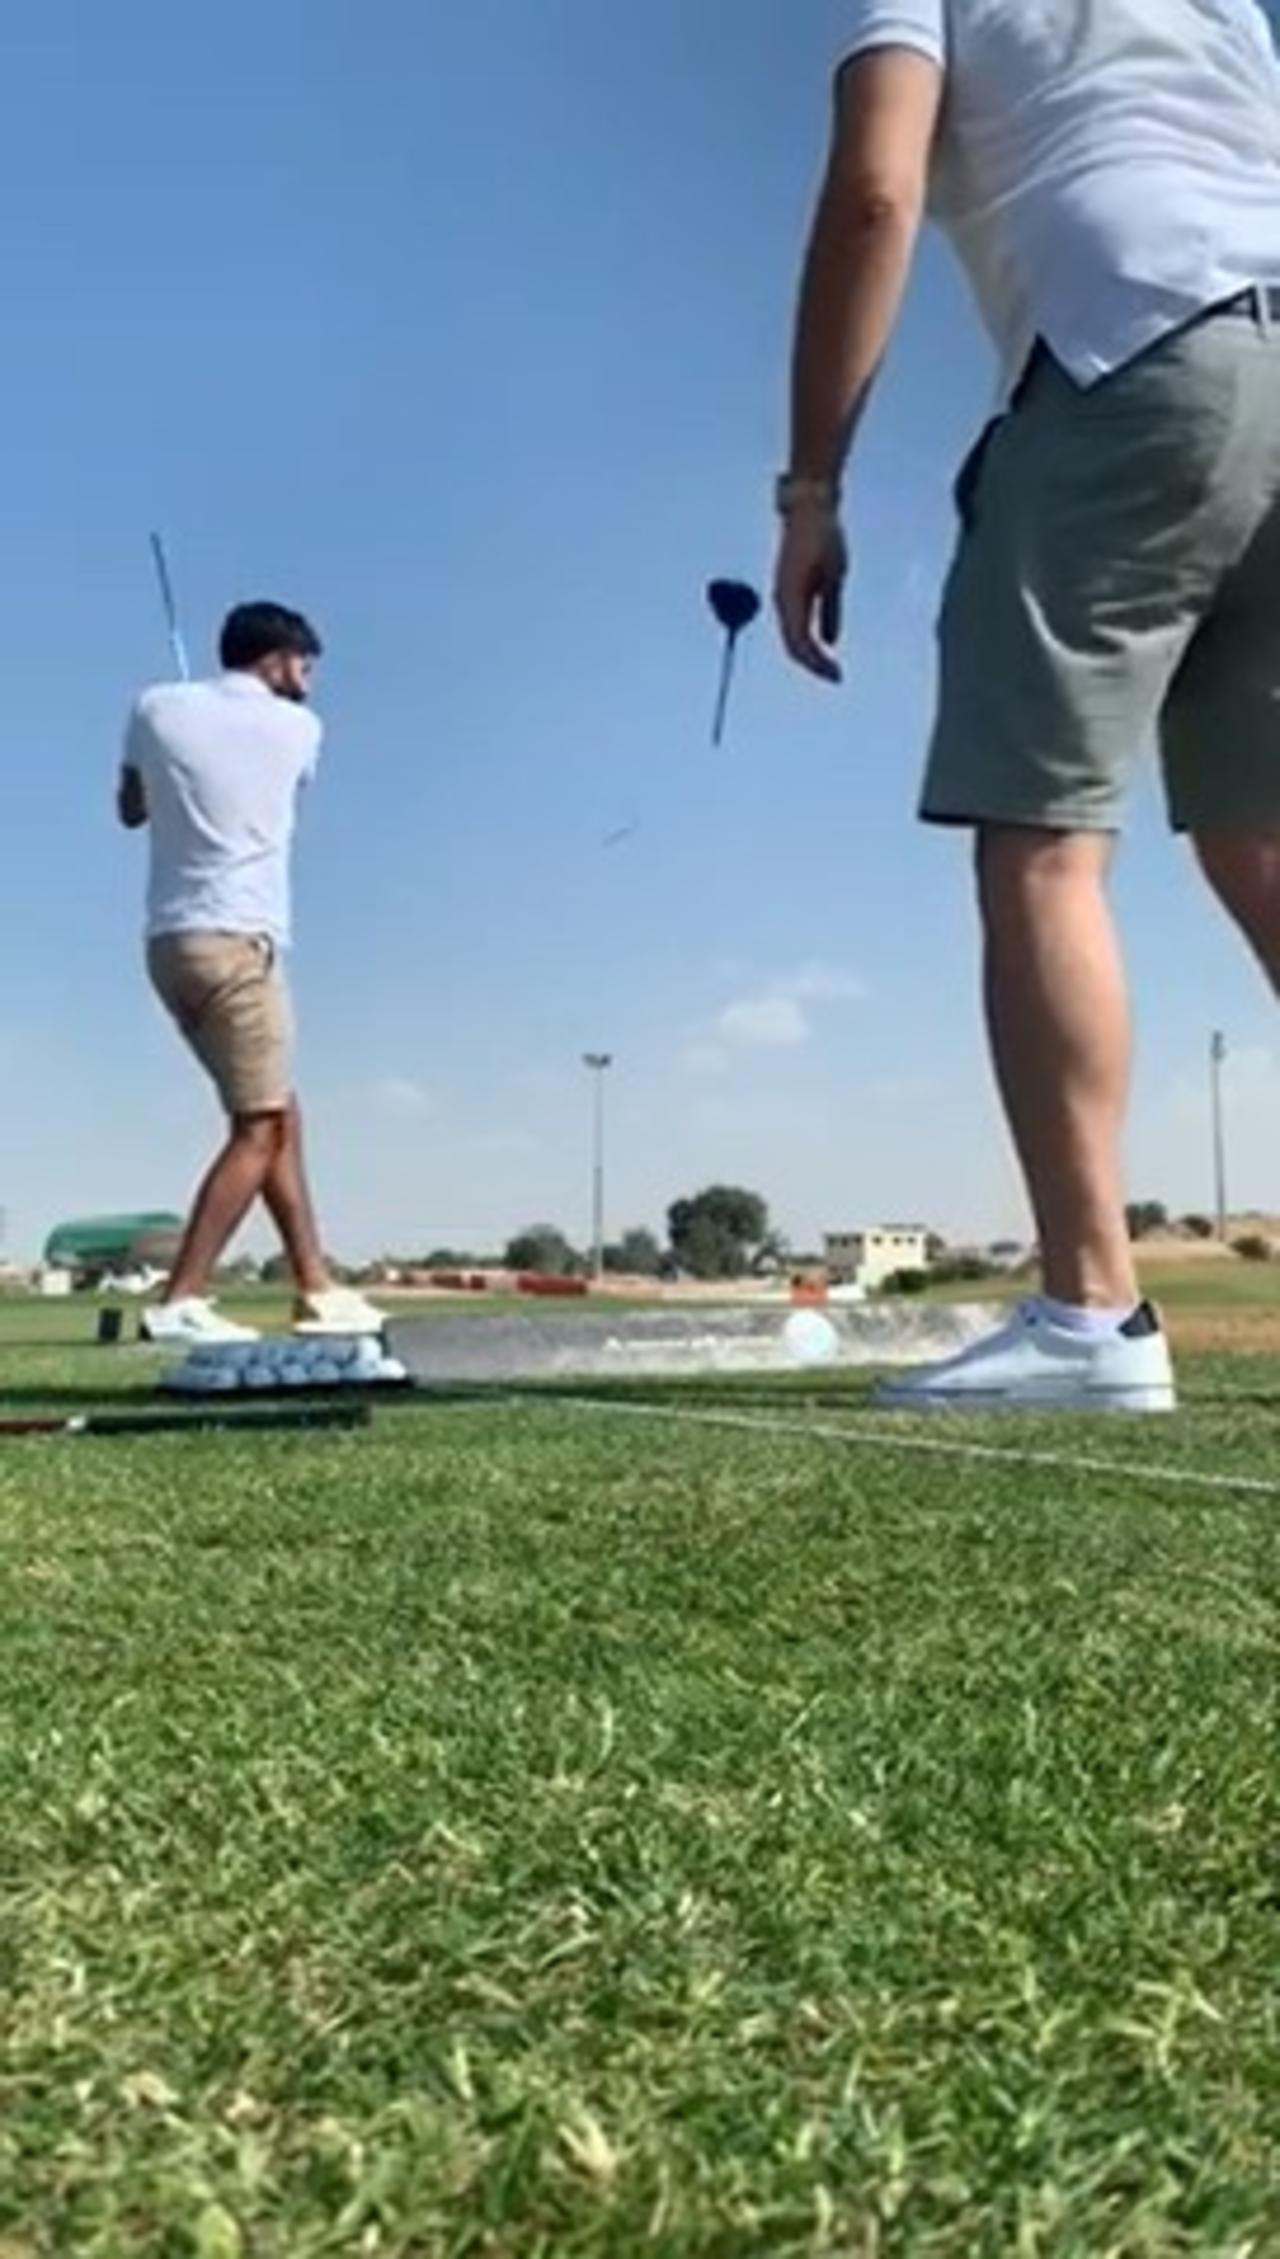 Golf Club Breaks When Guy Takes Shot